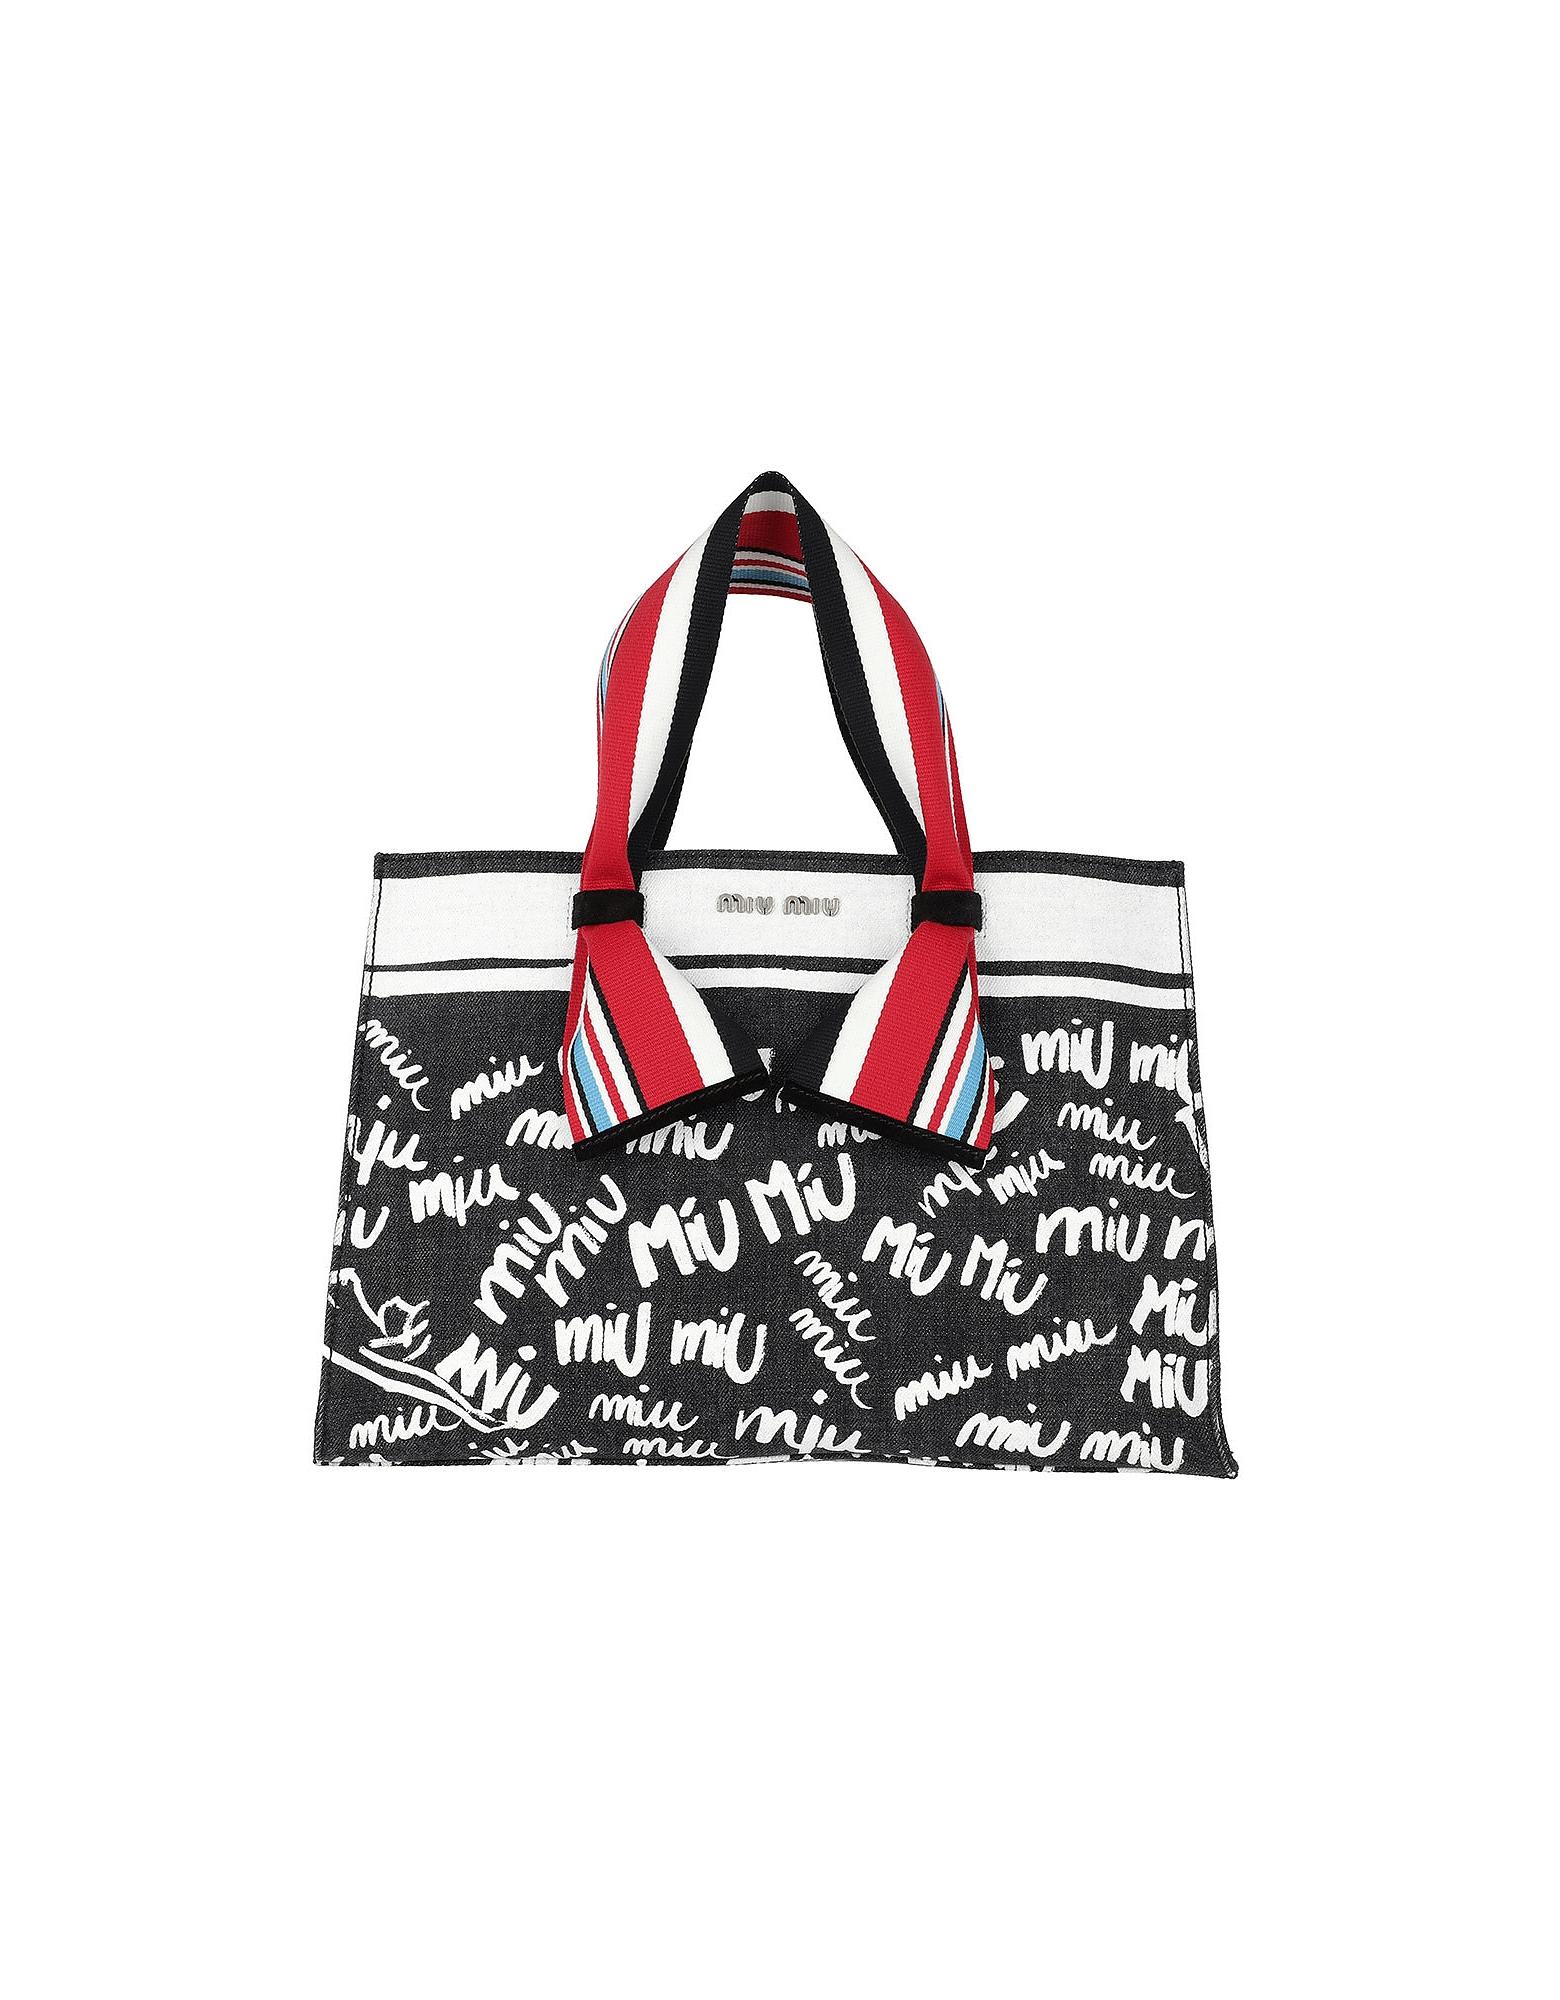 Miu Miu Handbags, Denim Logo Shopping Bag Nero/Bianco